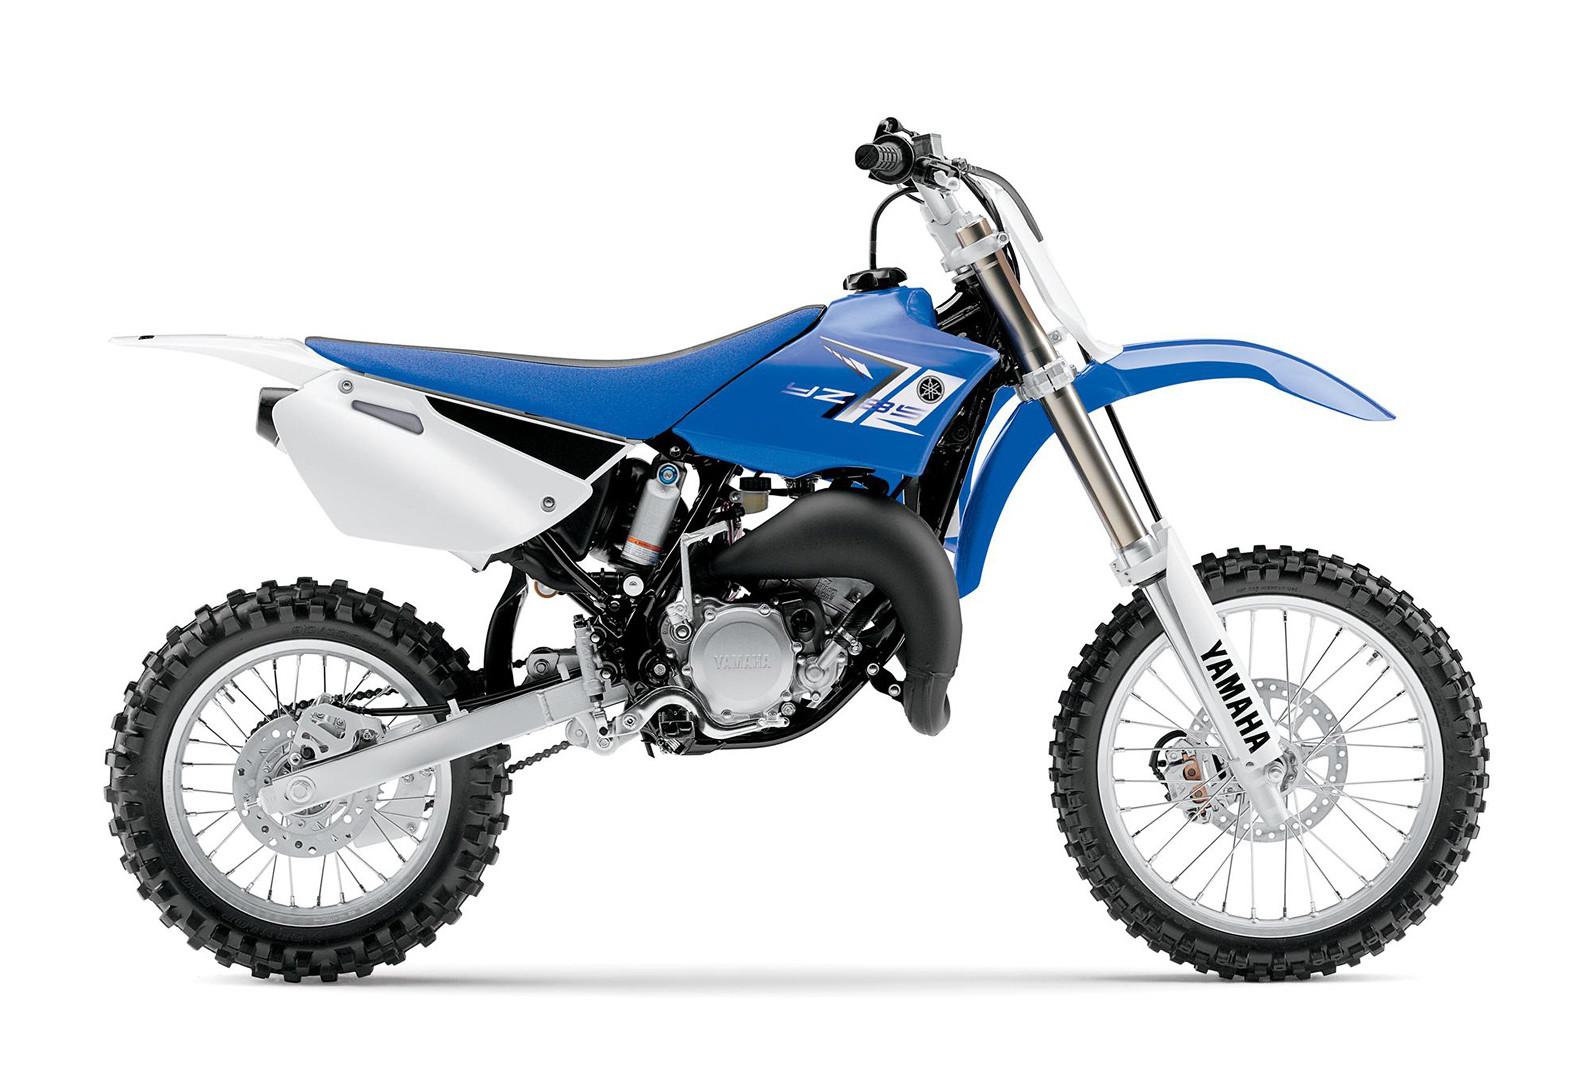 2013 yamaha yz85 reviews comparisons specs motocross. Black Bedroom Furniture Sets. Home Design Ideas